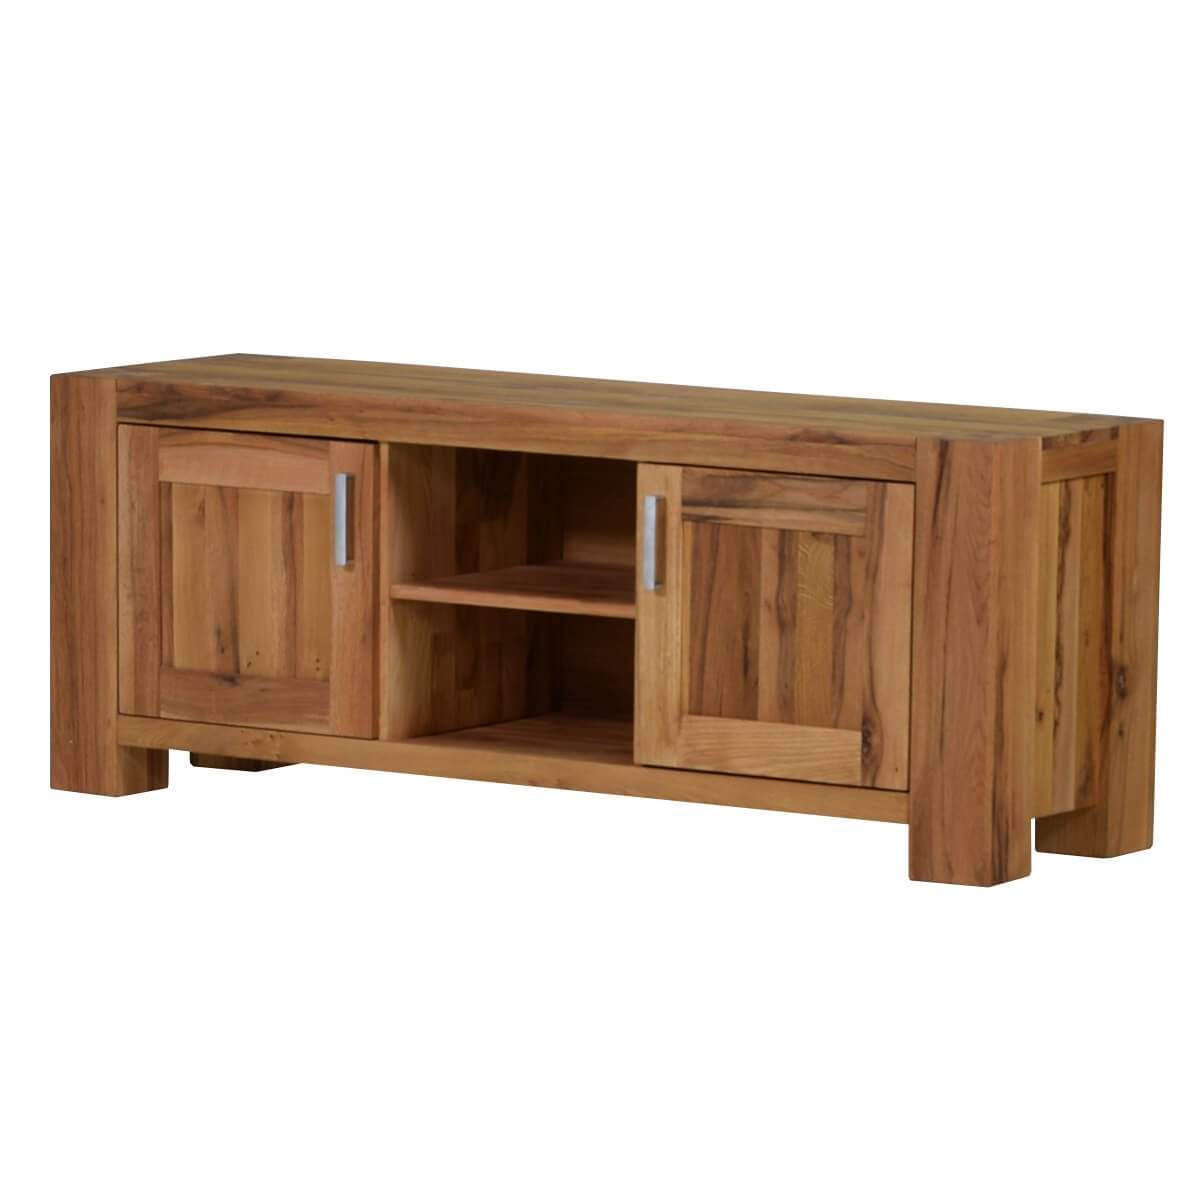 TV-Lowboard TV-Bank Braxton, Massivholz Holz Eiche massiv natur geölt, Breite 170 cm, Tiefe 47 cm, Höhe 64 cm